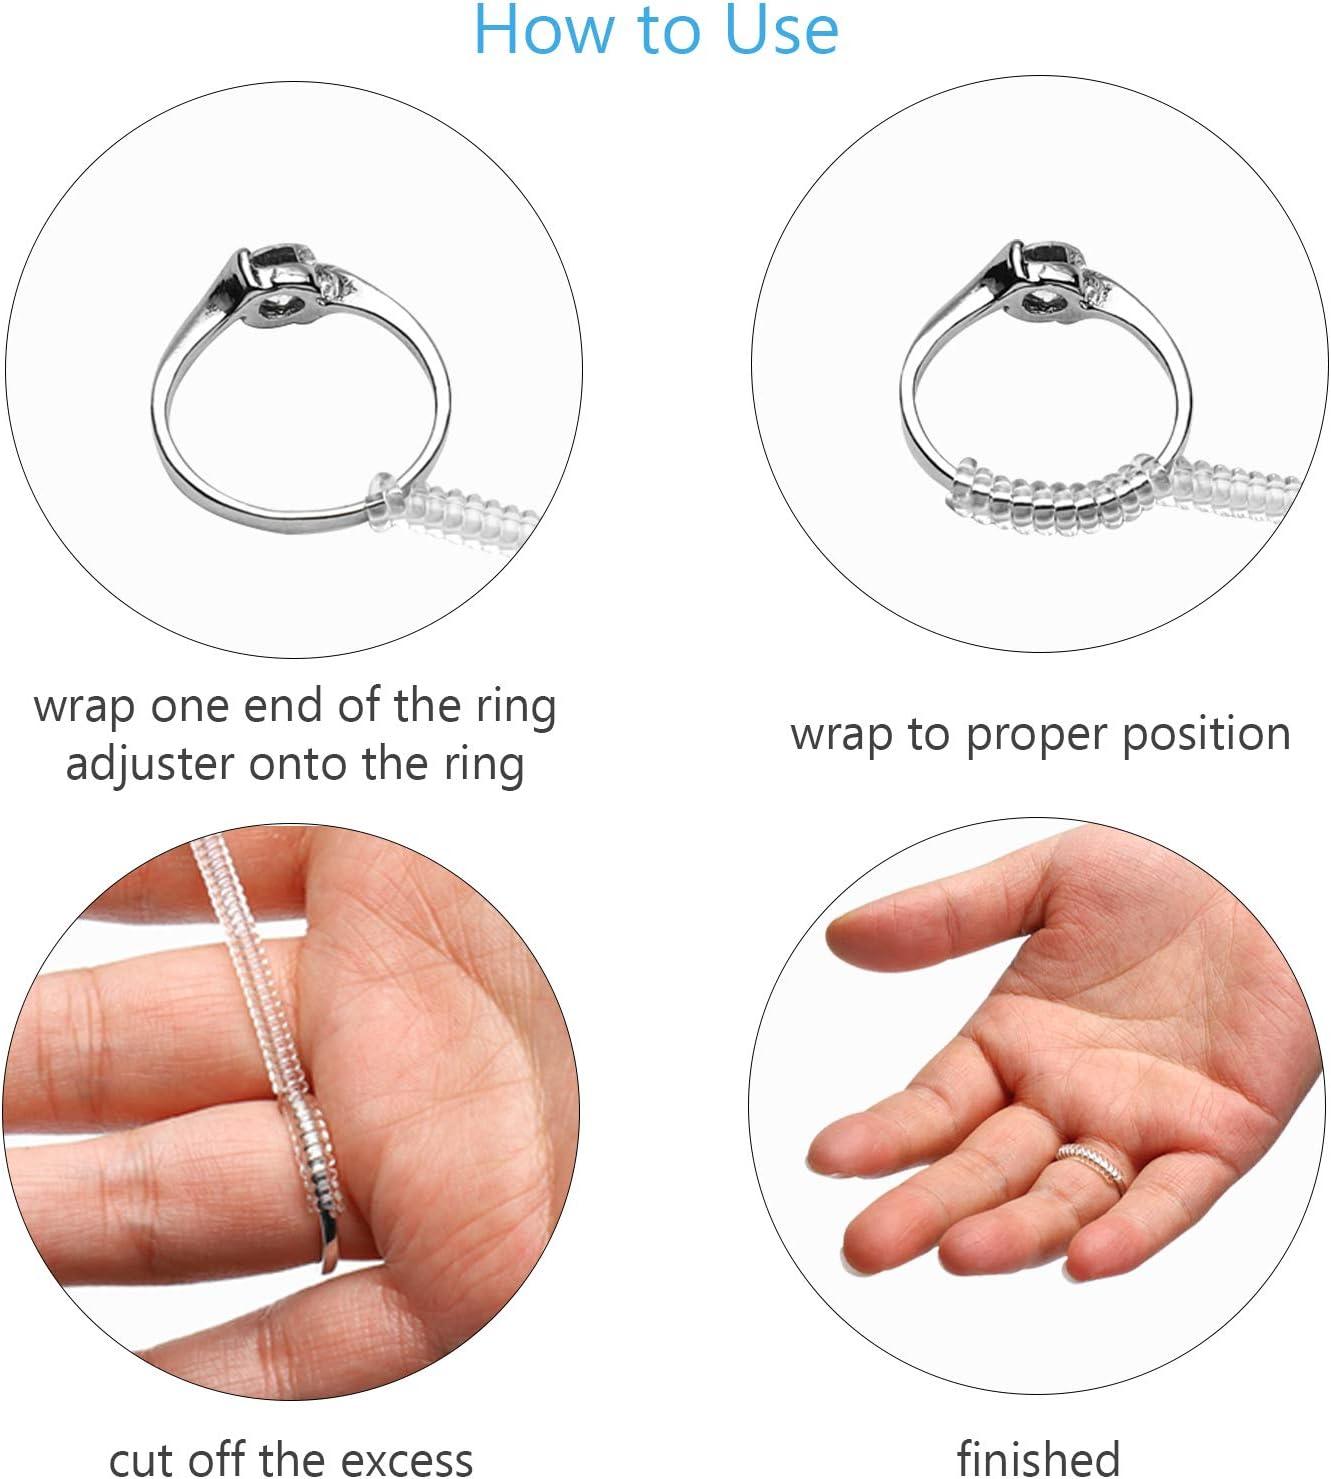 TAZEMAT 2 Ringgr/ö/ßenmesser Finger Size Measure 2 Ringgr/ö/ßenmesser mit ausf/ührlicher Anleitung 6 Ring Guard f/ür Lose Ringe f/ür Damen Herren Schmuck Gr/ö/ßenstandard UK USA